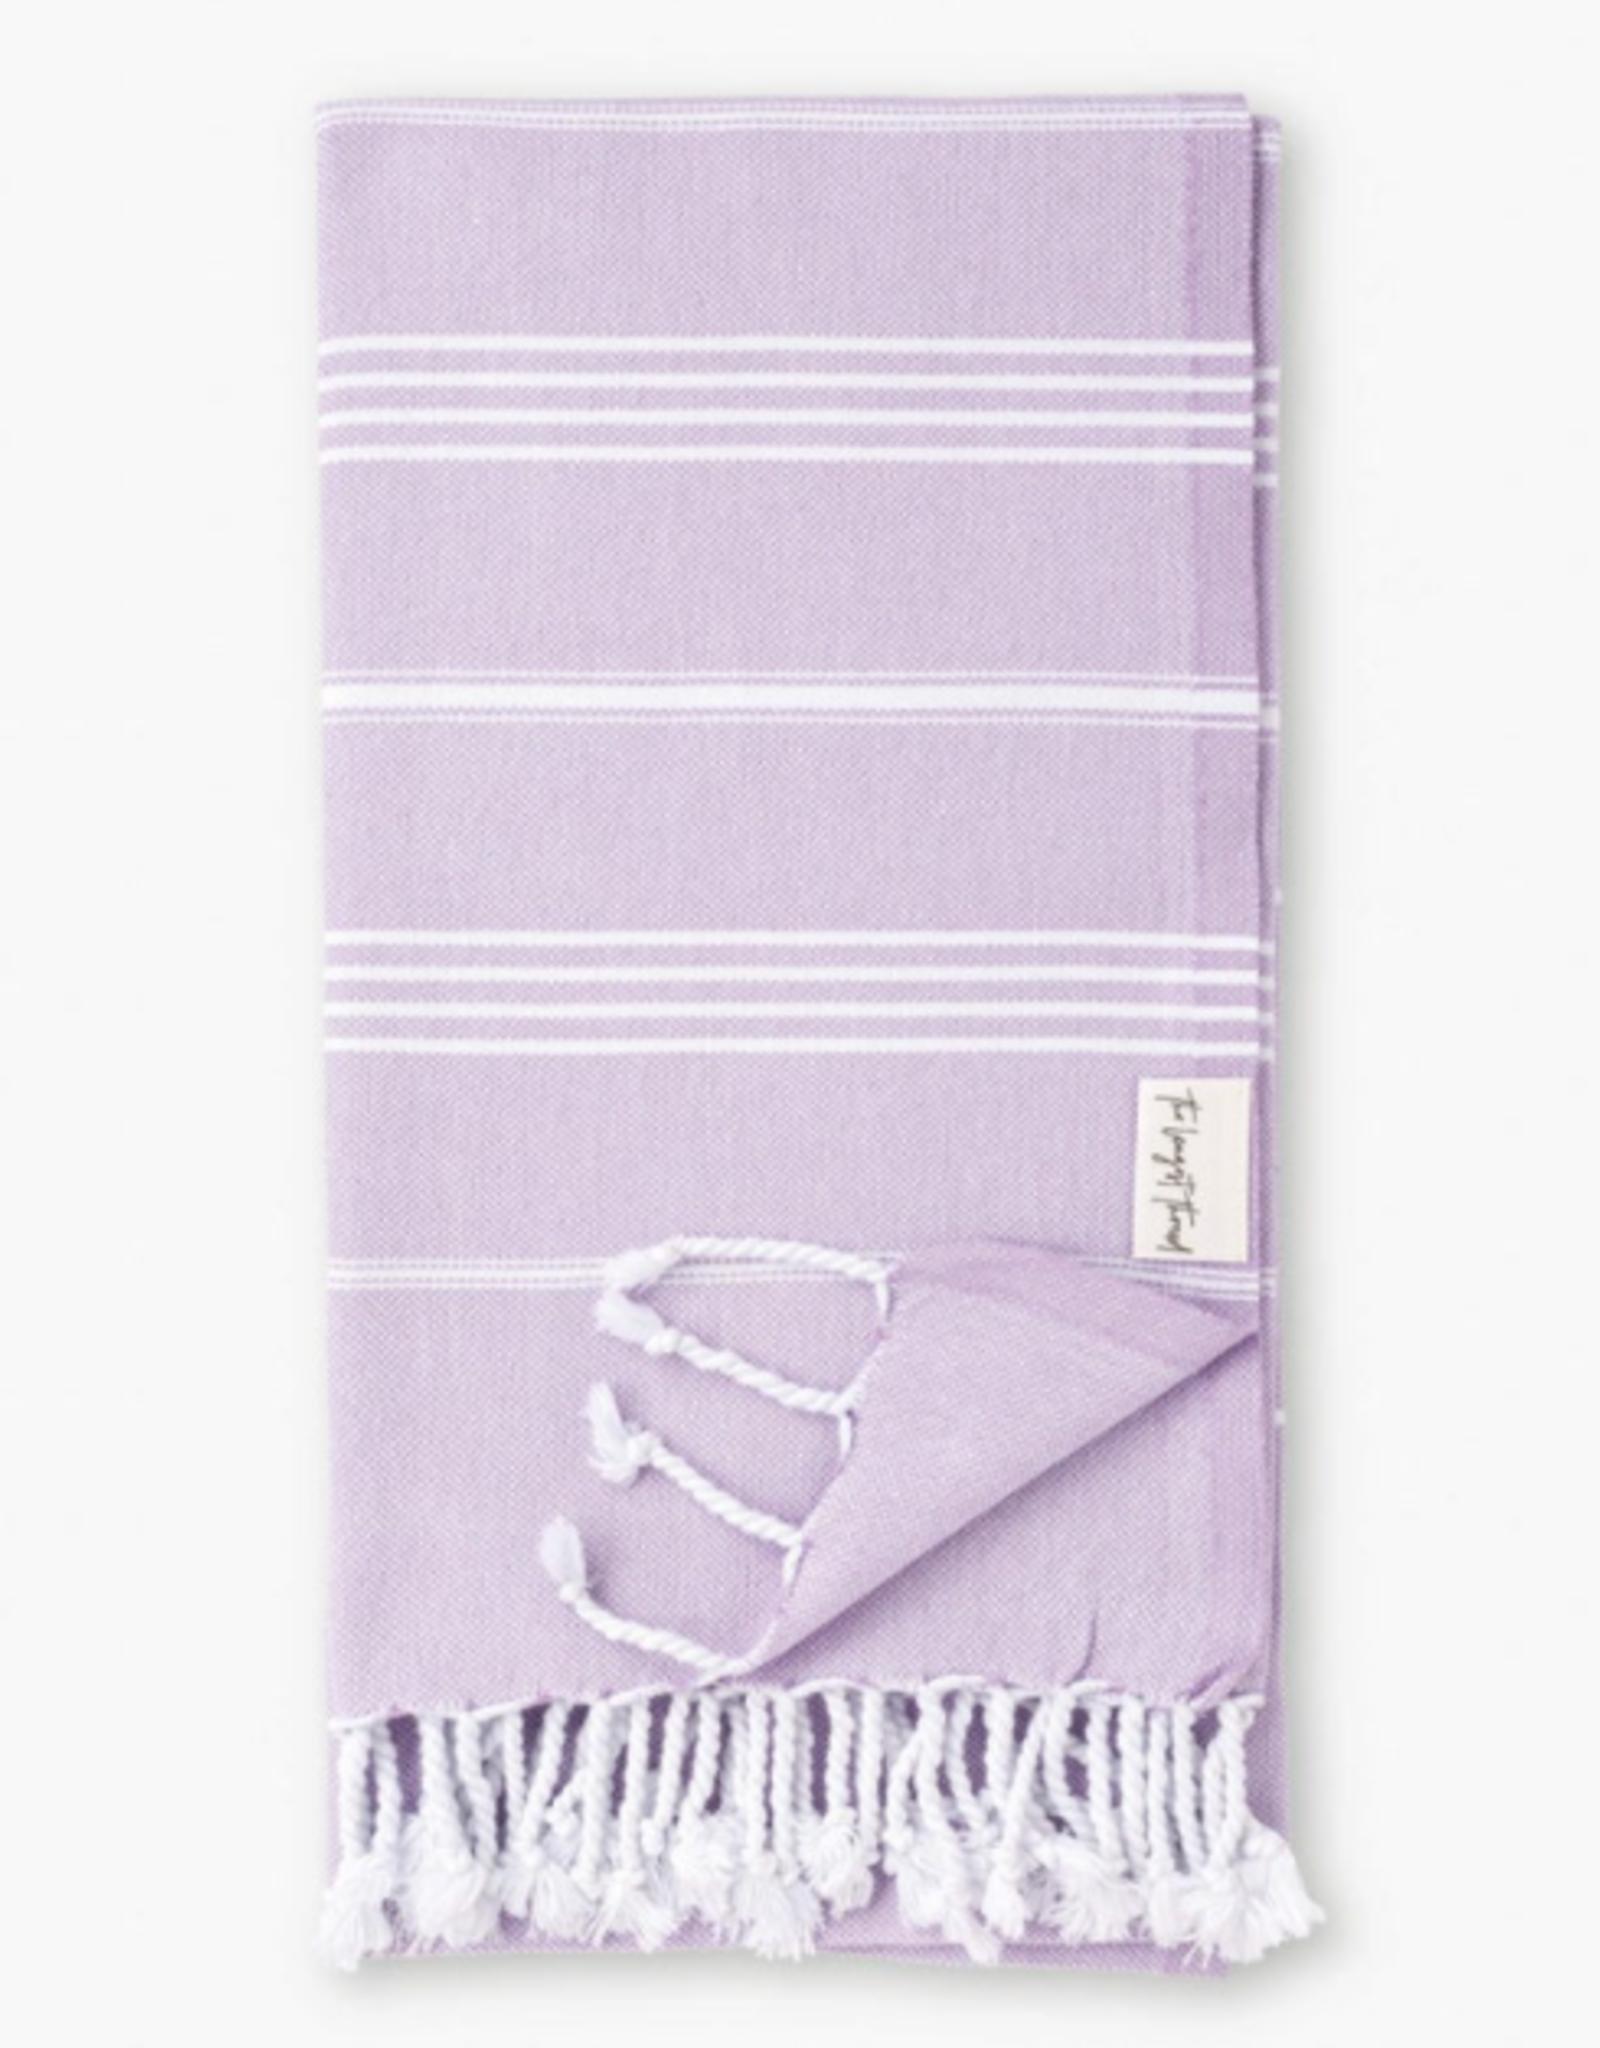 The Longest Thread Turkish Bath Towel - Lavender